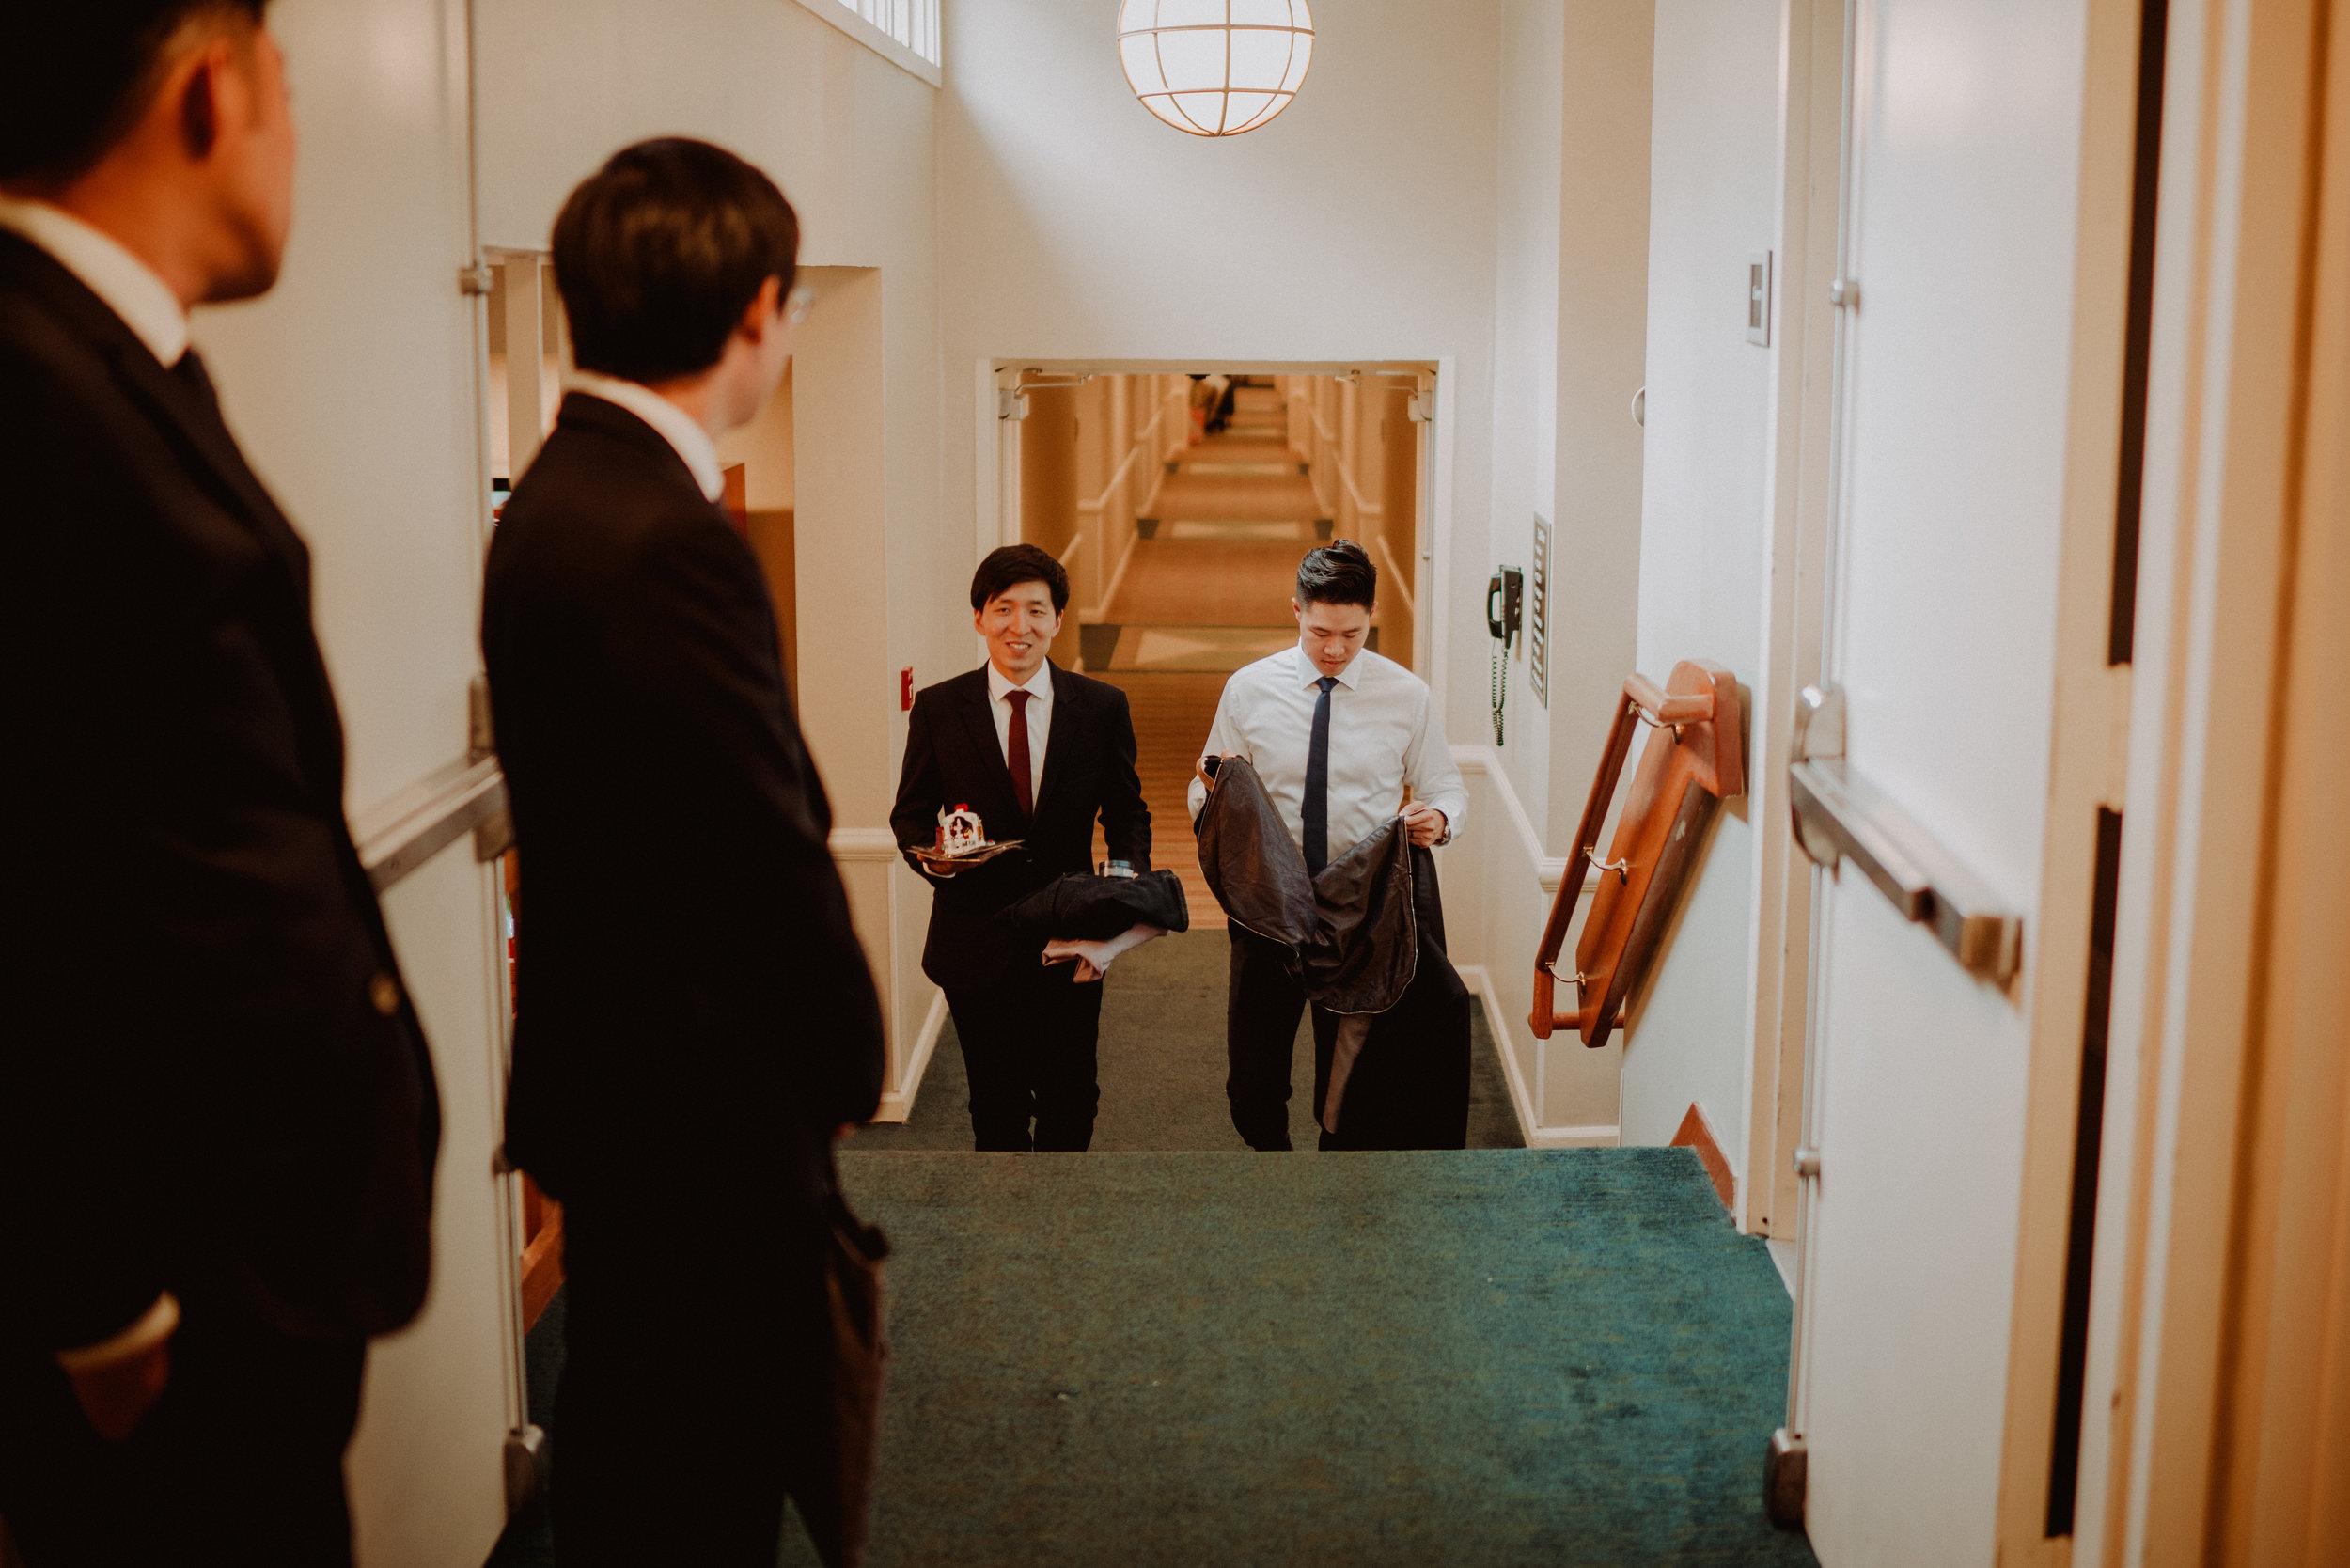 Irene-and-Jae-2019_Brooklyn_Wedding_Photographer_Chellise_Michael_Photography--3.jpg